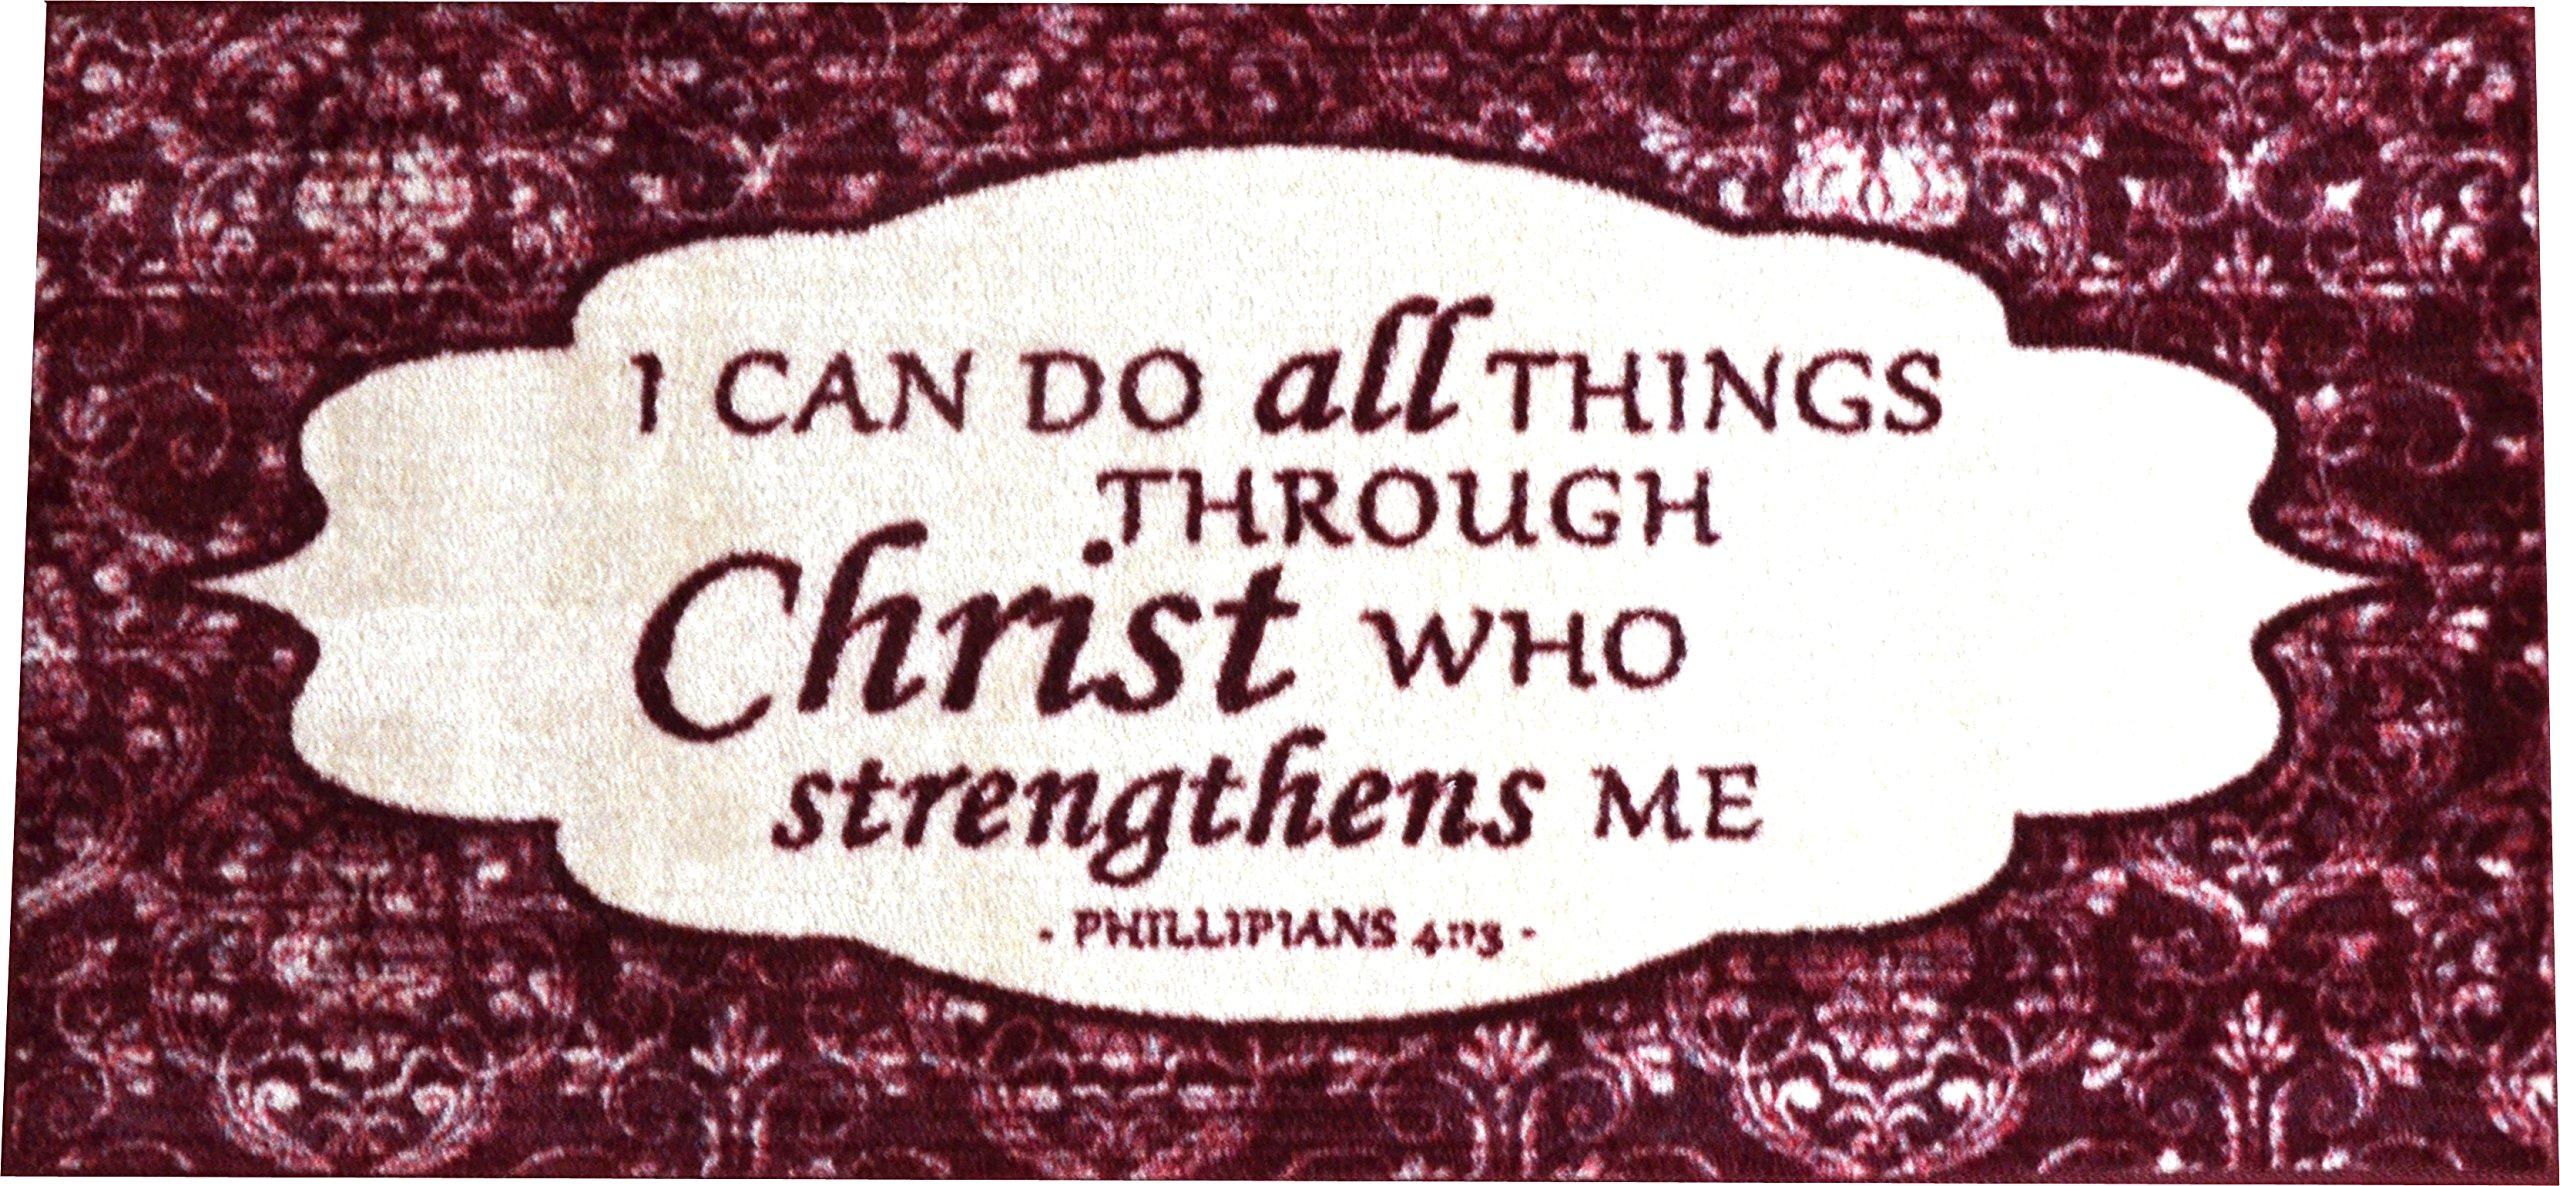 Dean Washable Non-Skid ''Philippians 4:13'' Christian Faith Bible Based Carpet Runner Mat/Rug 20'' x 44'' Color: Cranberry by Dean Flooring Company